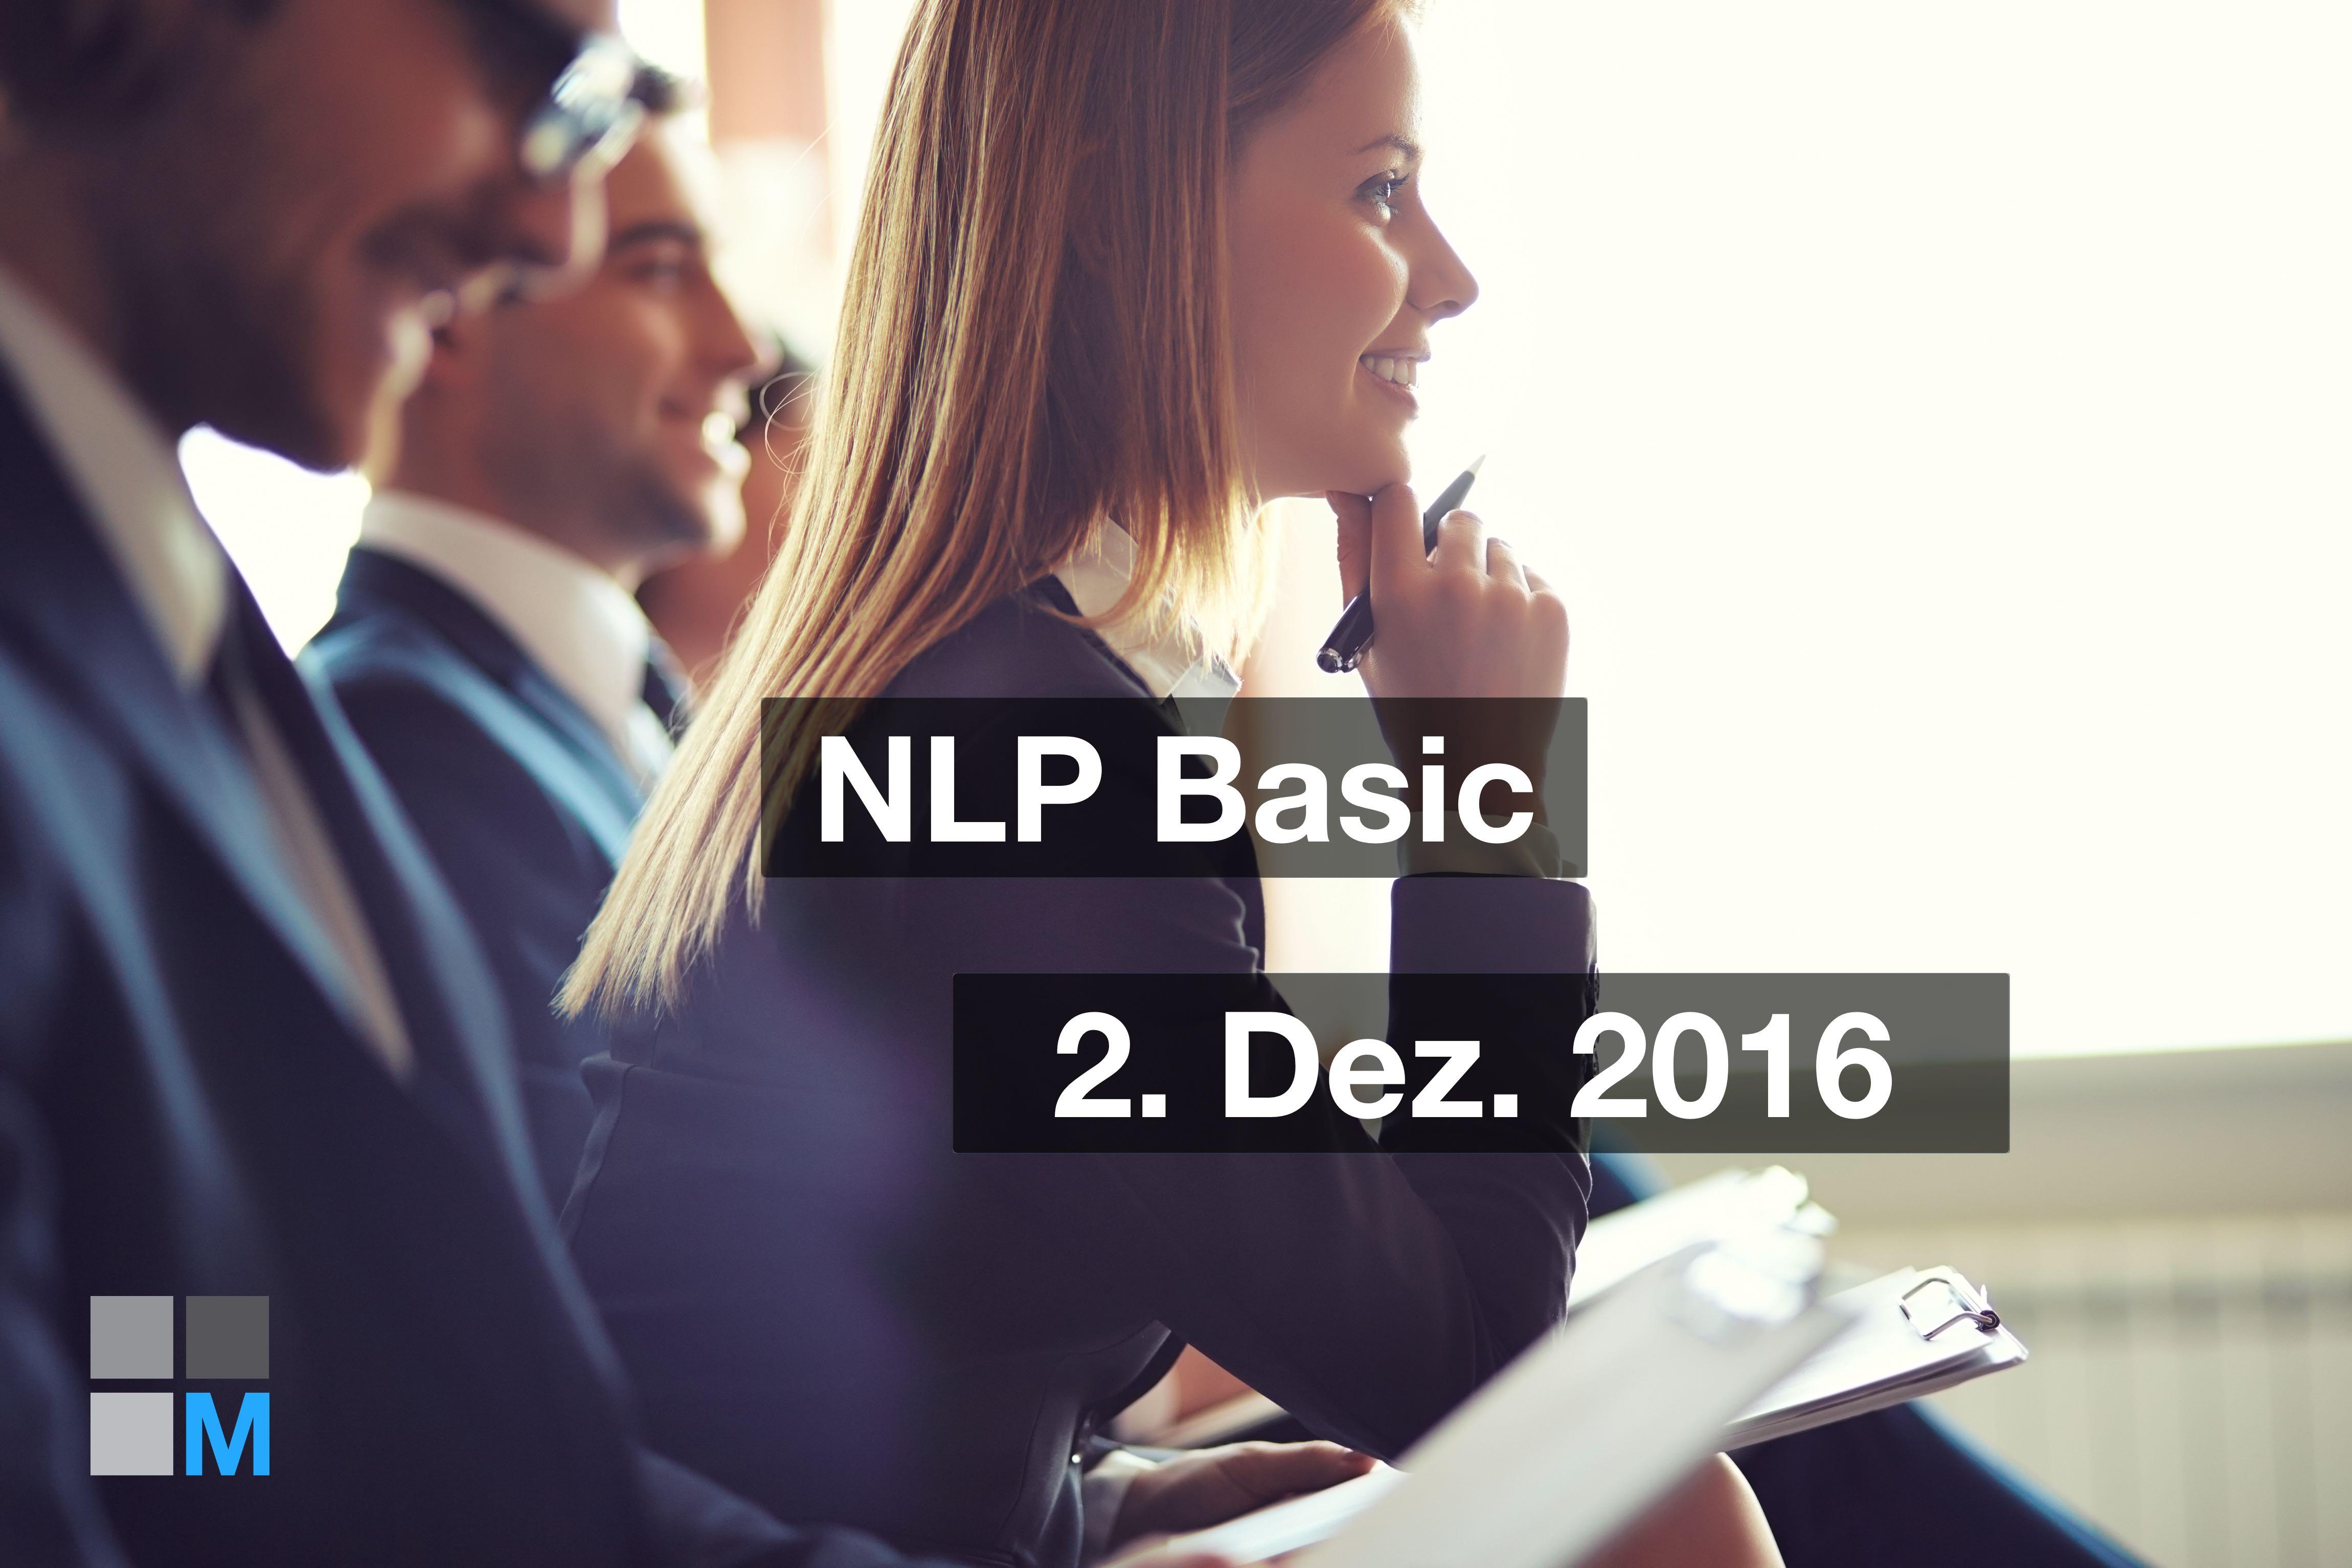 NLP Basic 2. & 3.12.2016